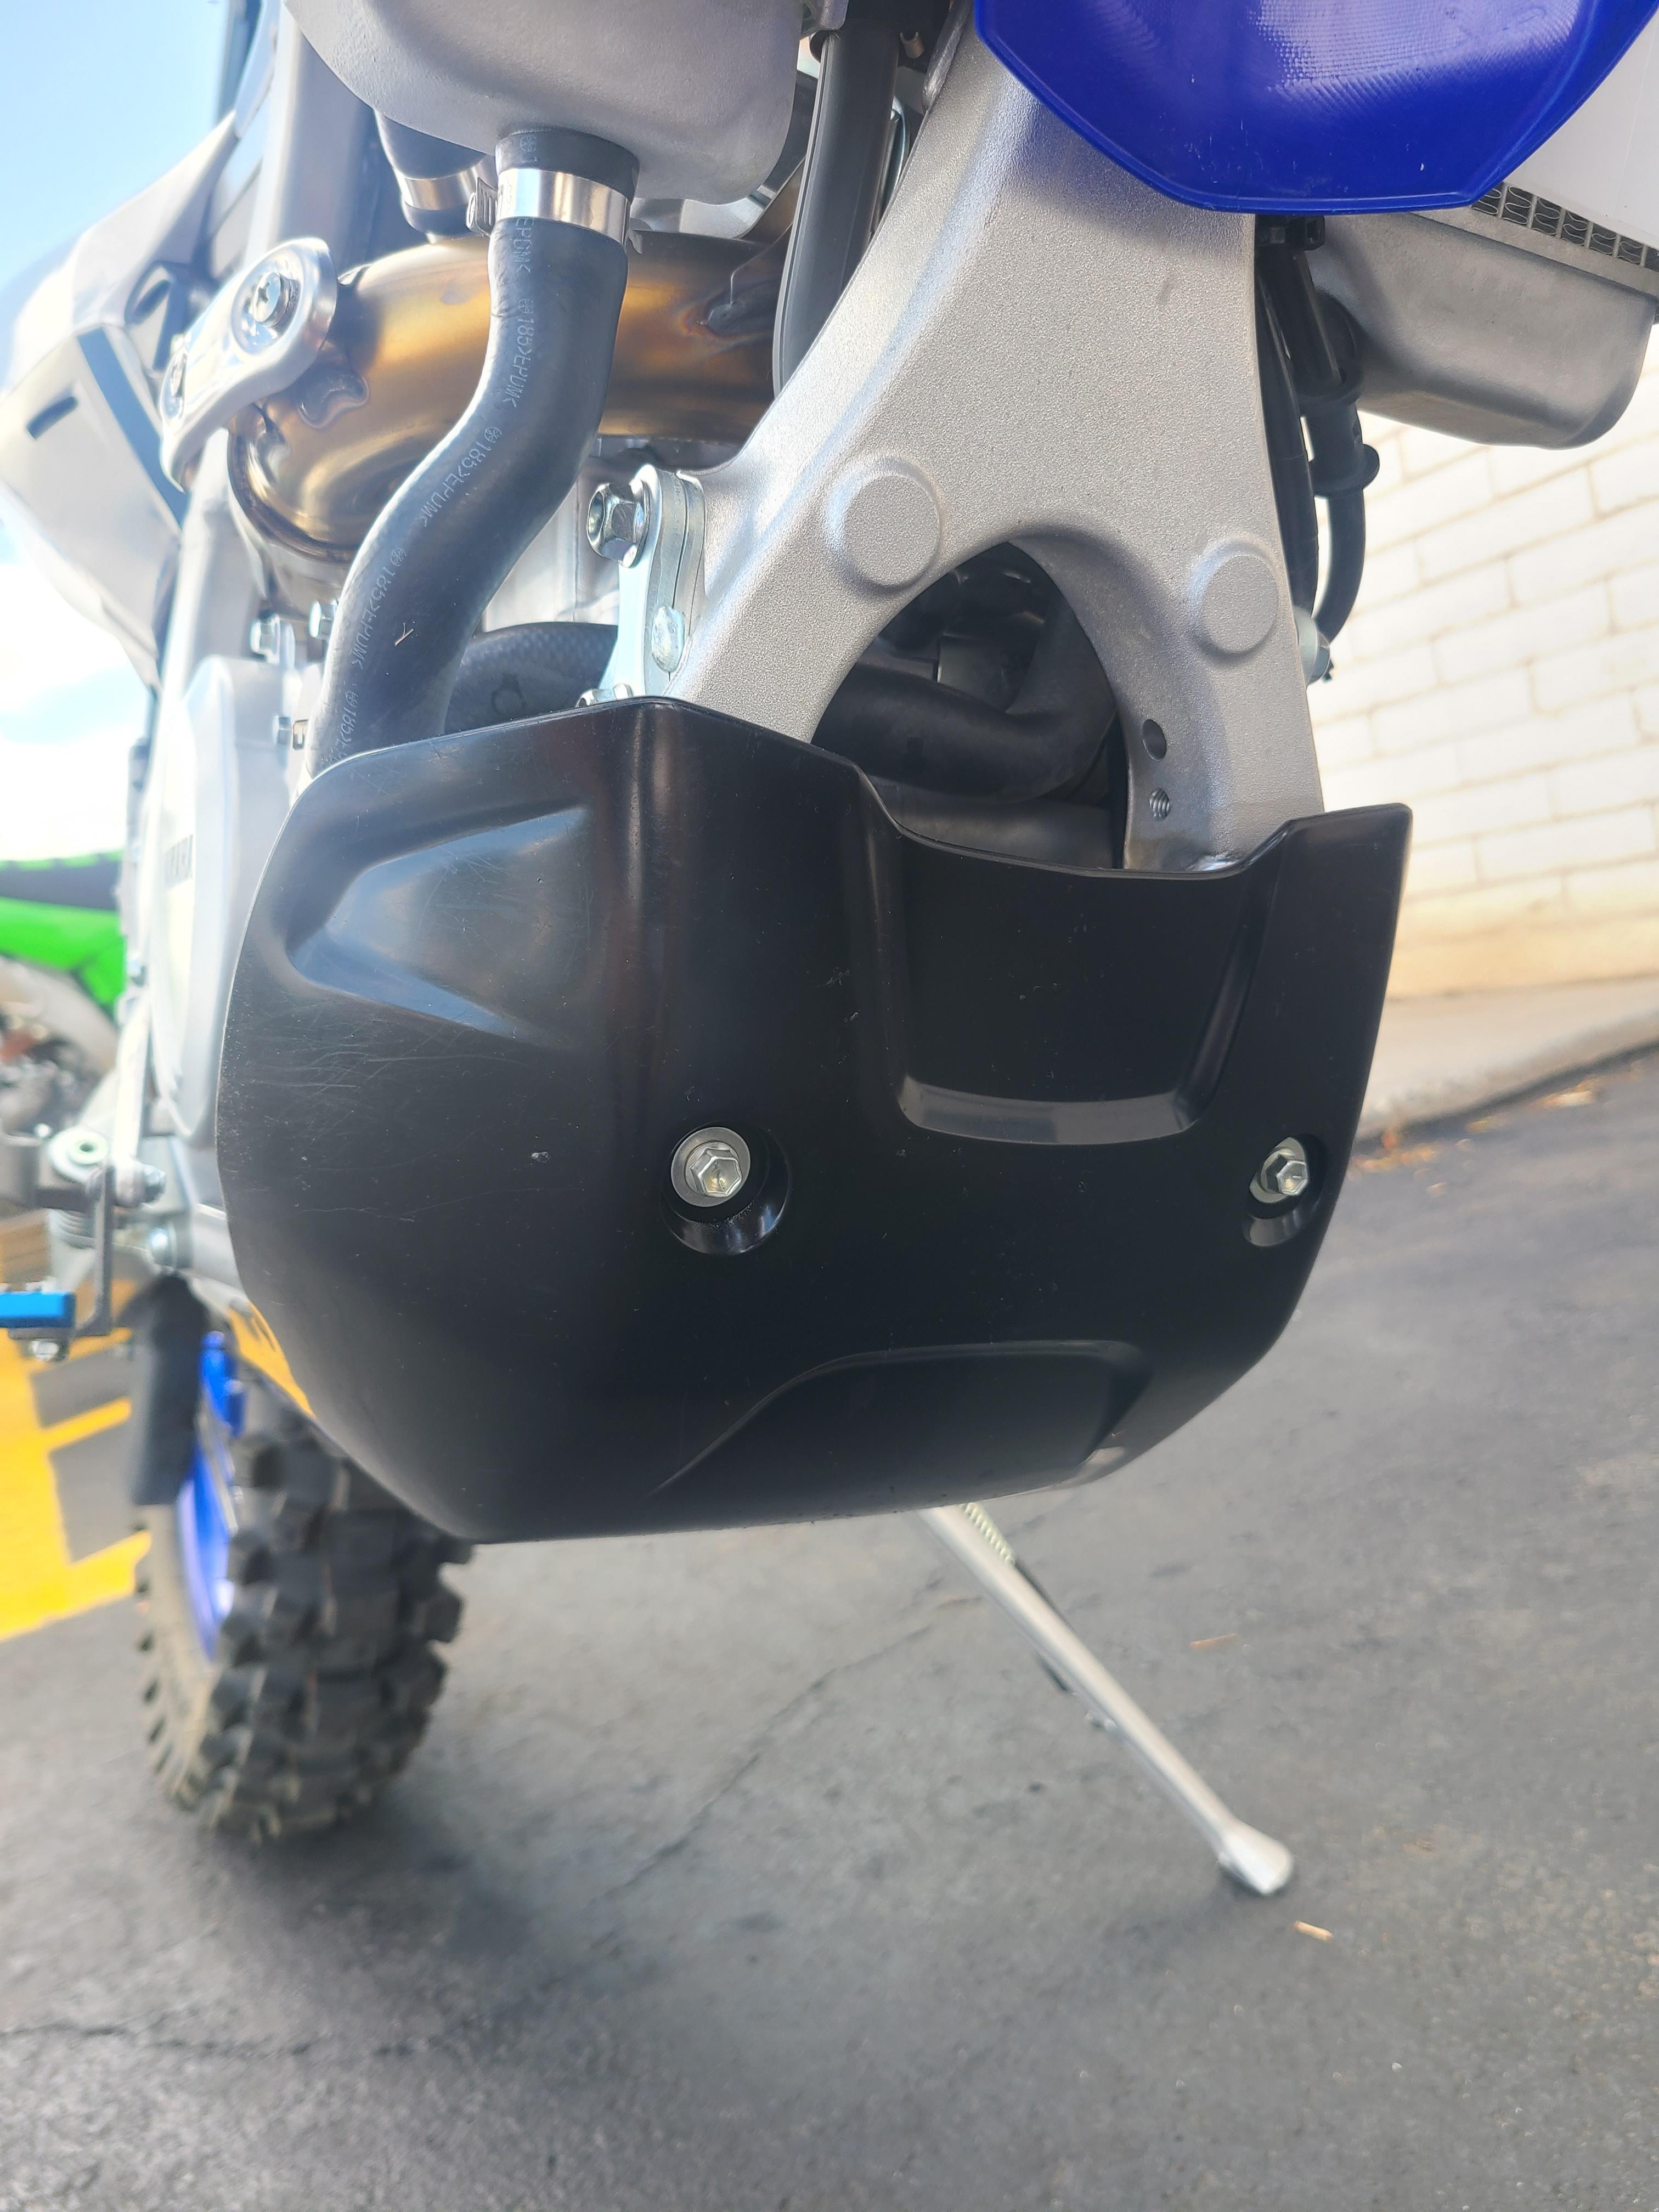 2017 Yamaha YZ 250FX at Bobby J's Yamaha, Albuquerque, NM 87110